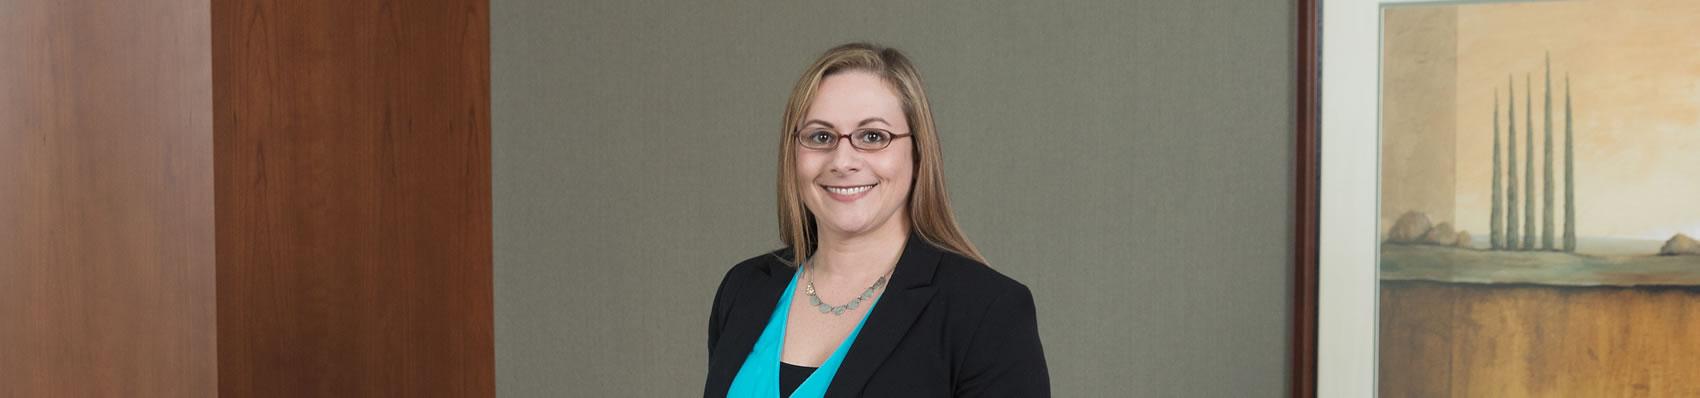 Jessica Diamond, Associate with Pitzer Snodgrass, P.C.